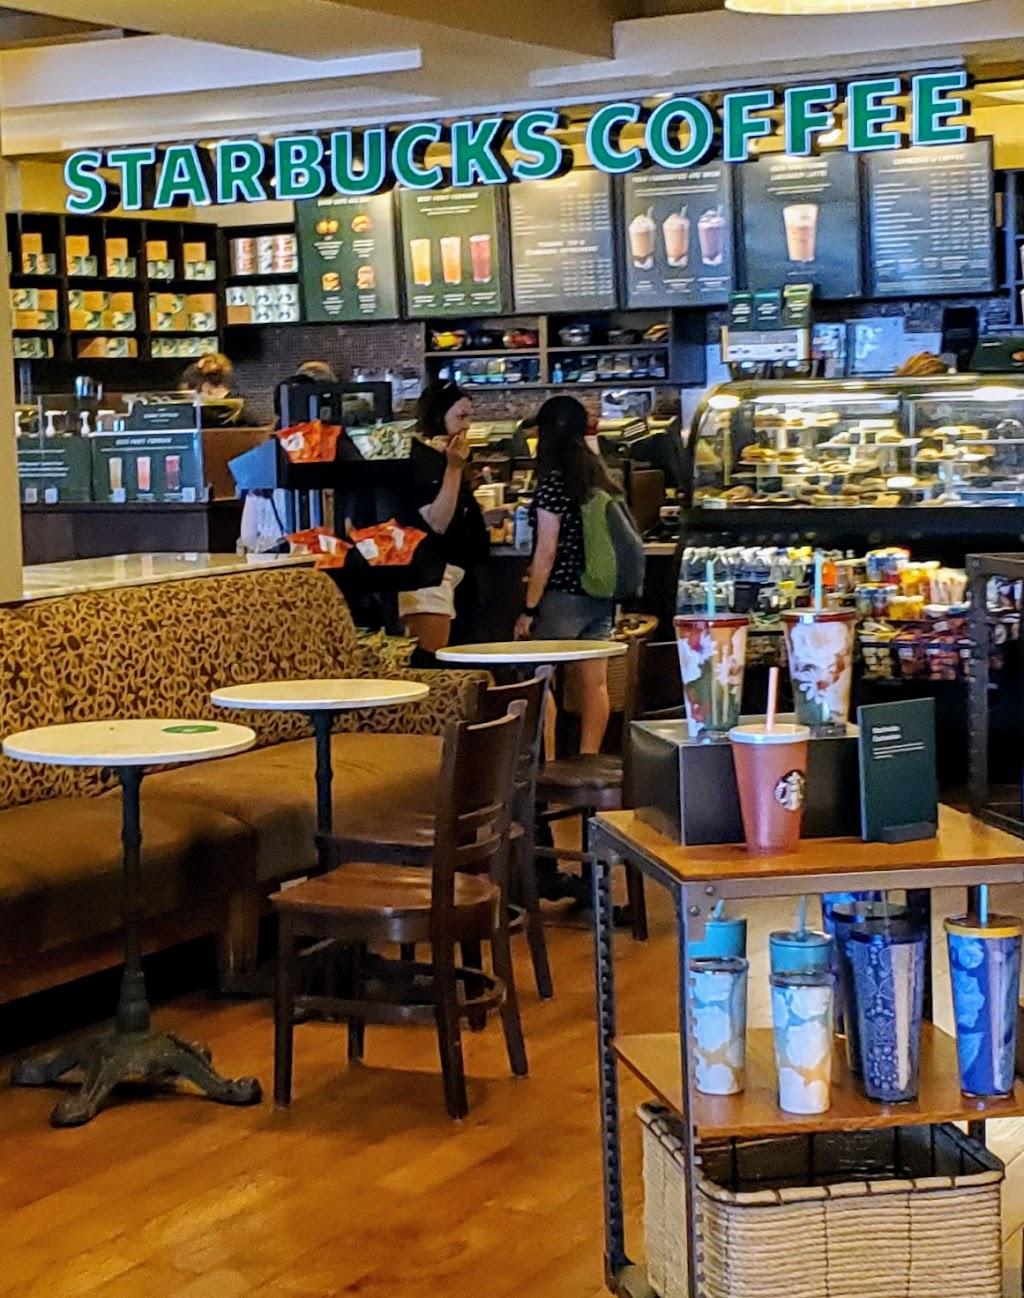 Starbucks (Niagara Falls Marriott on the Falls) | cafe | 6755 Fallsview Blvd, Niagara Falls, ON L2G 3W7, Canada | 9053741077 OR +1 905-374-1077